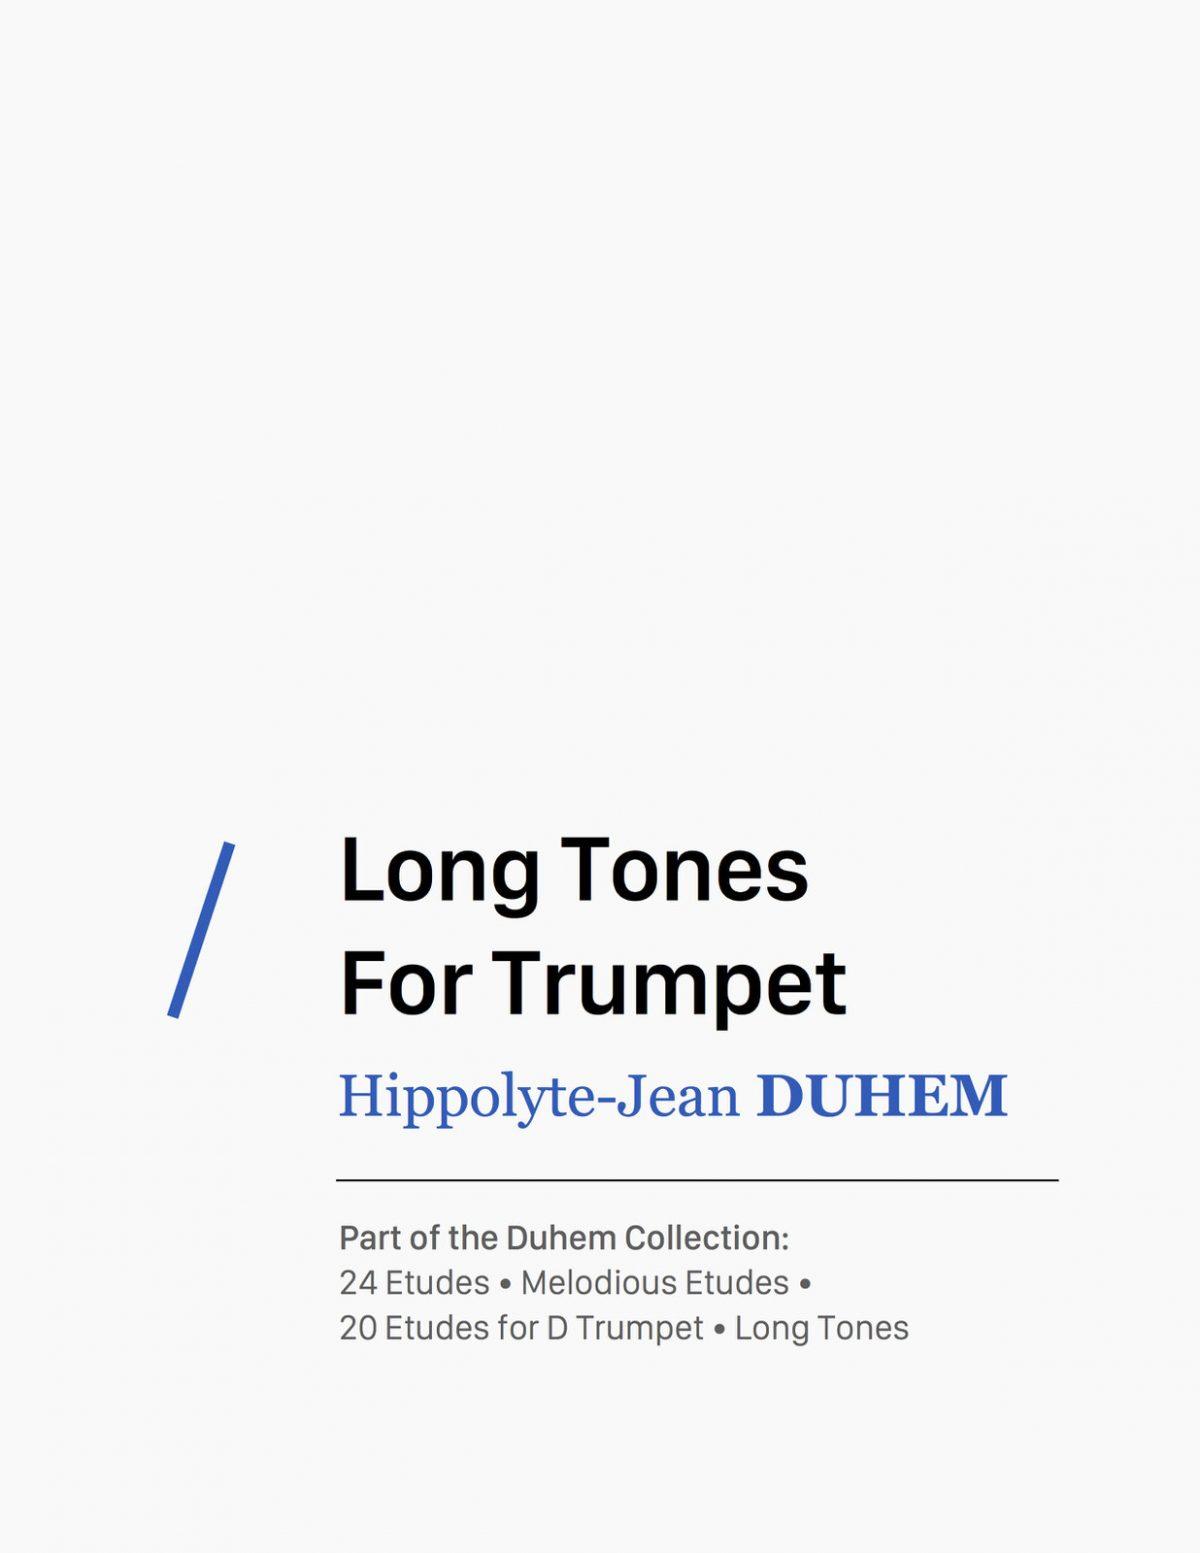 duhem-long-tones